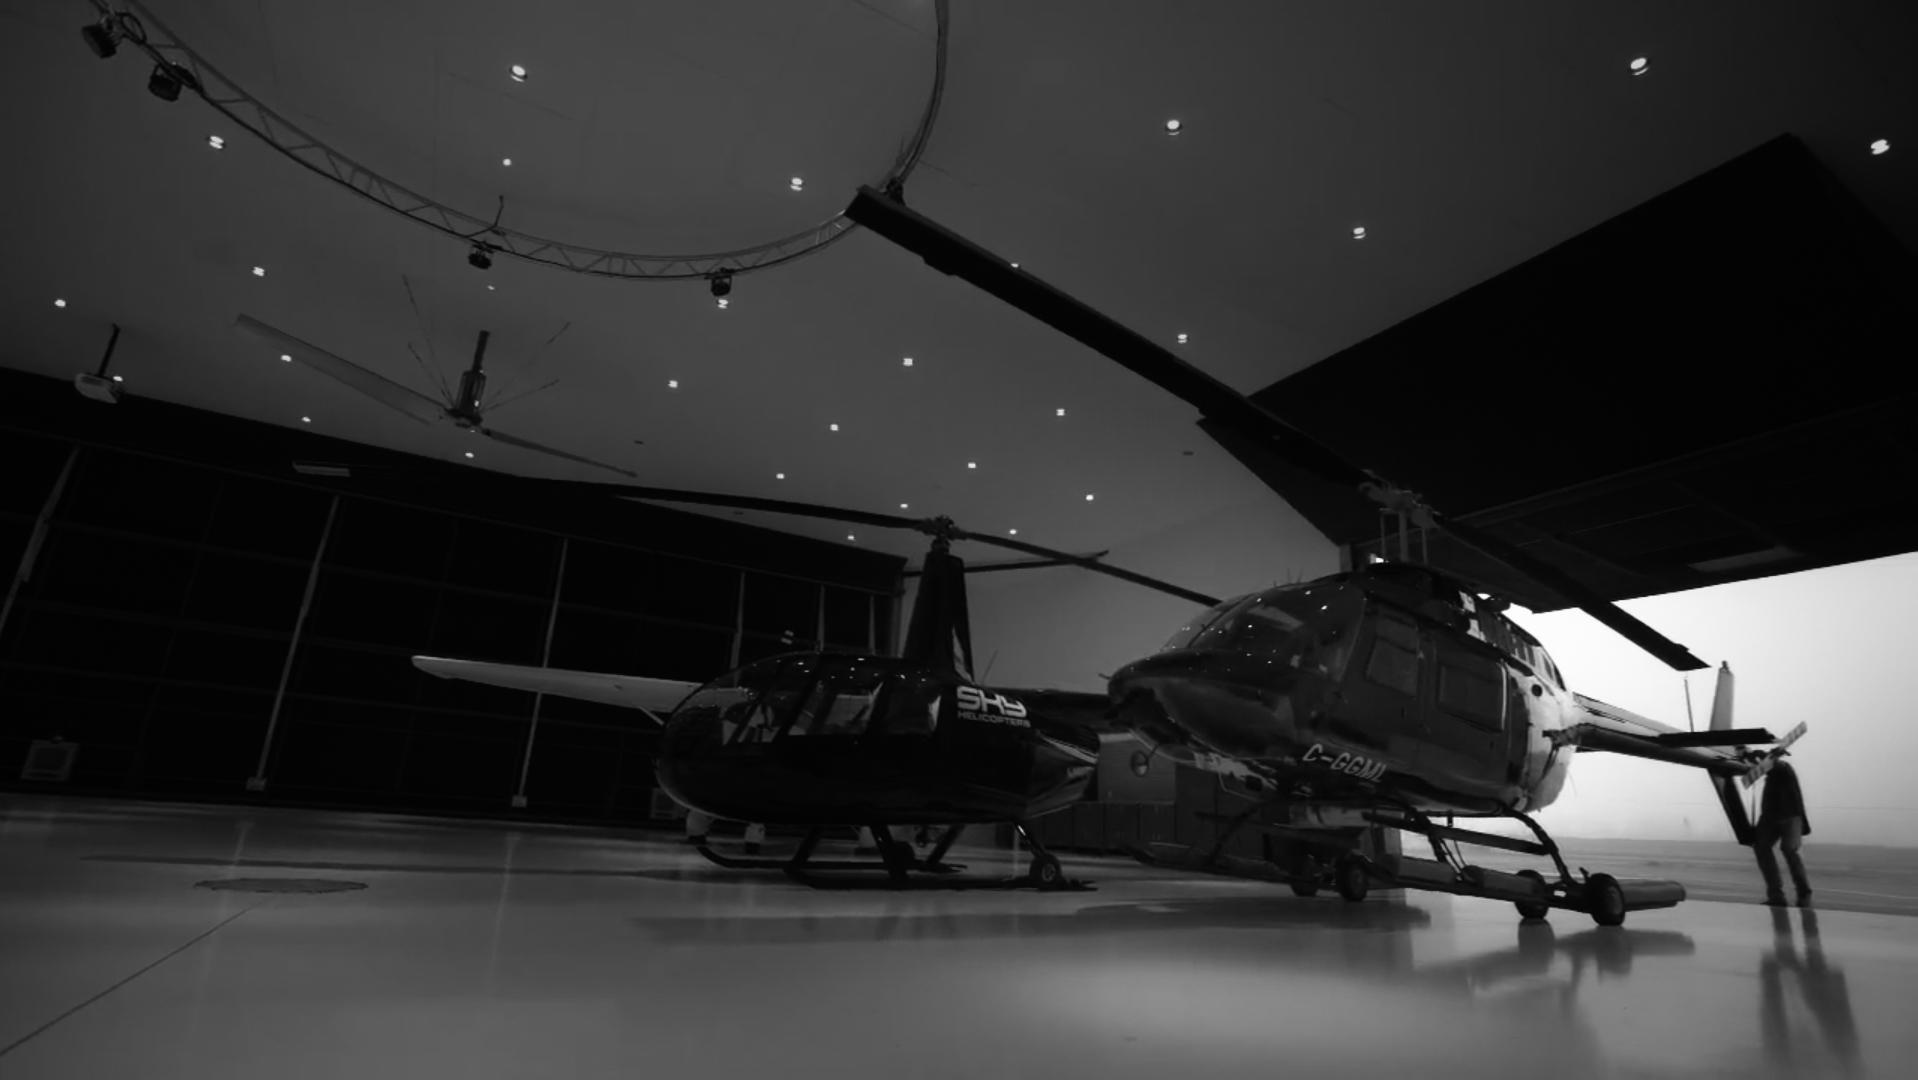 Sky Hangar: Event Hosting / Camera Operator and Assistant Director